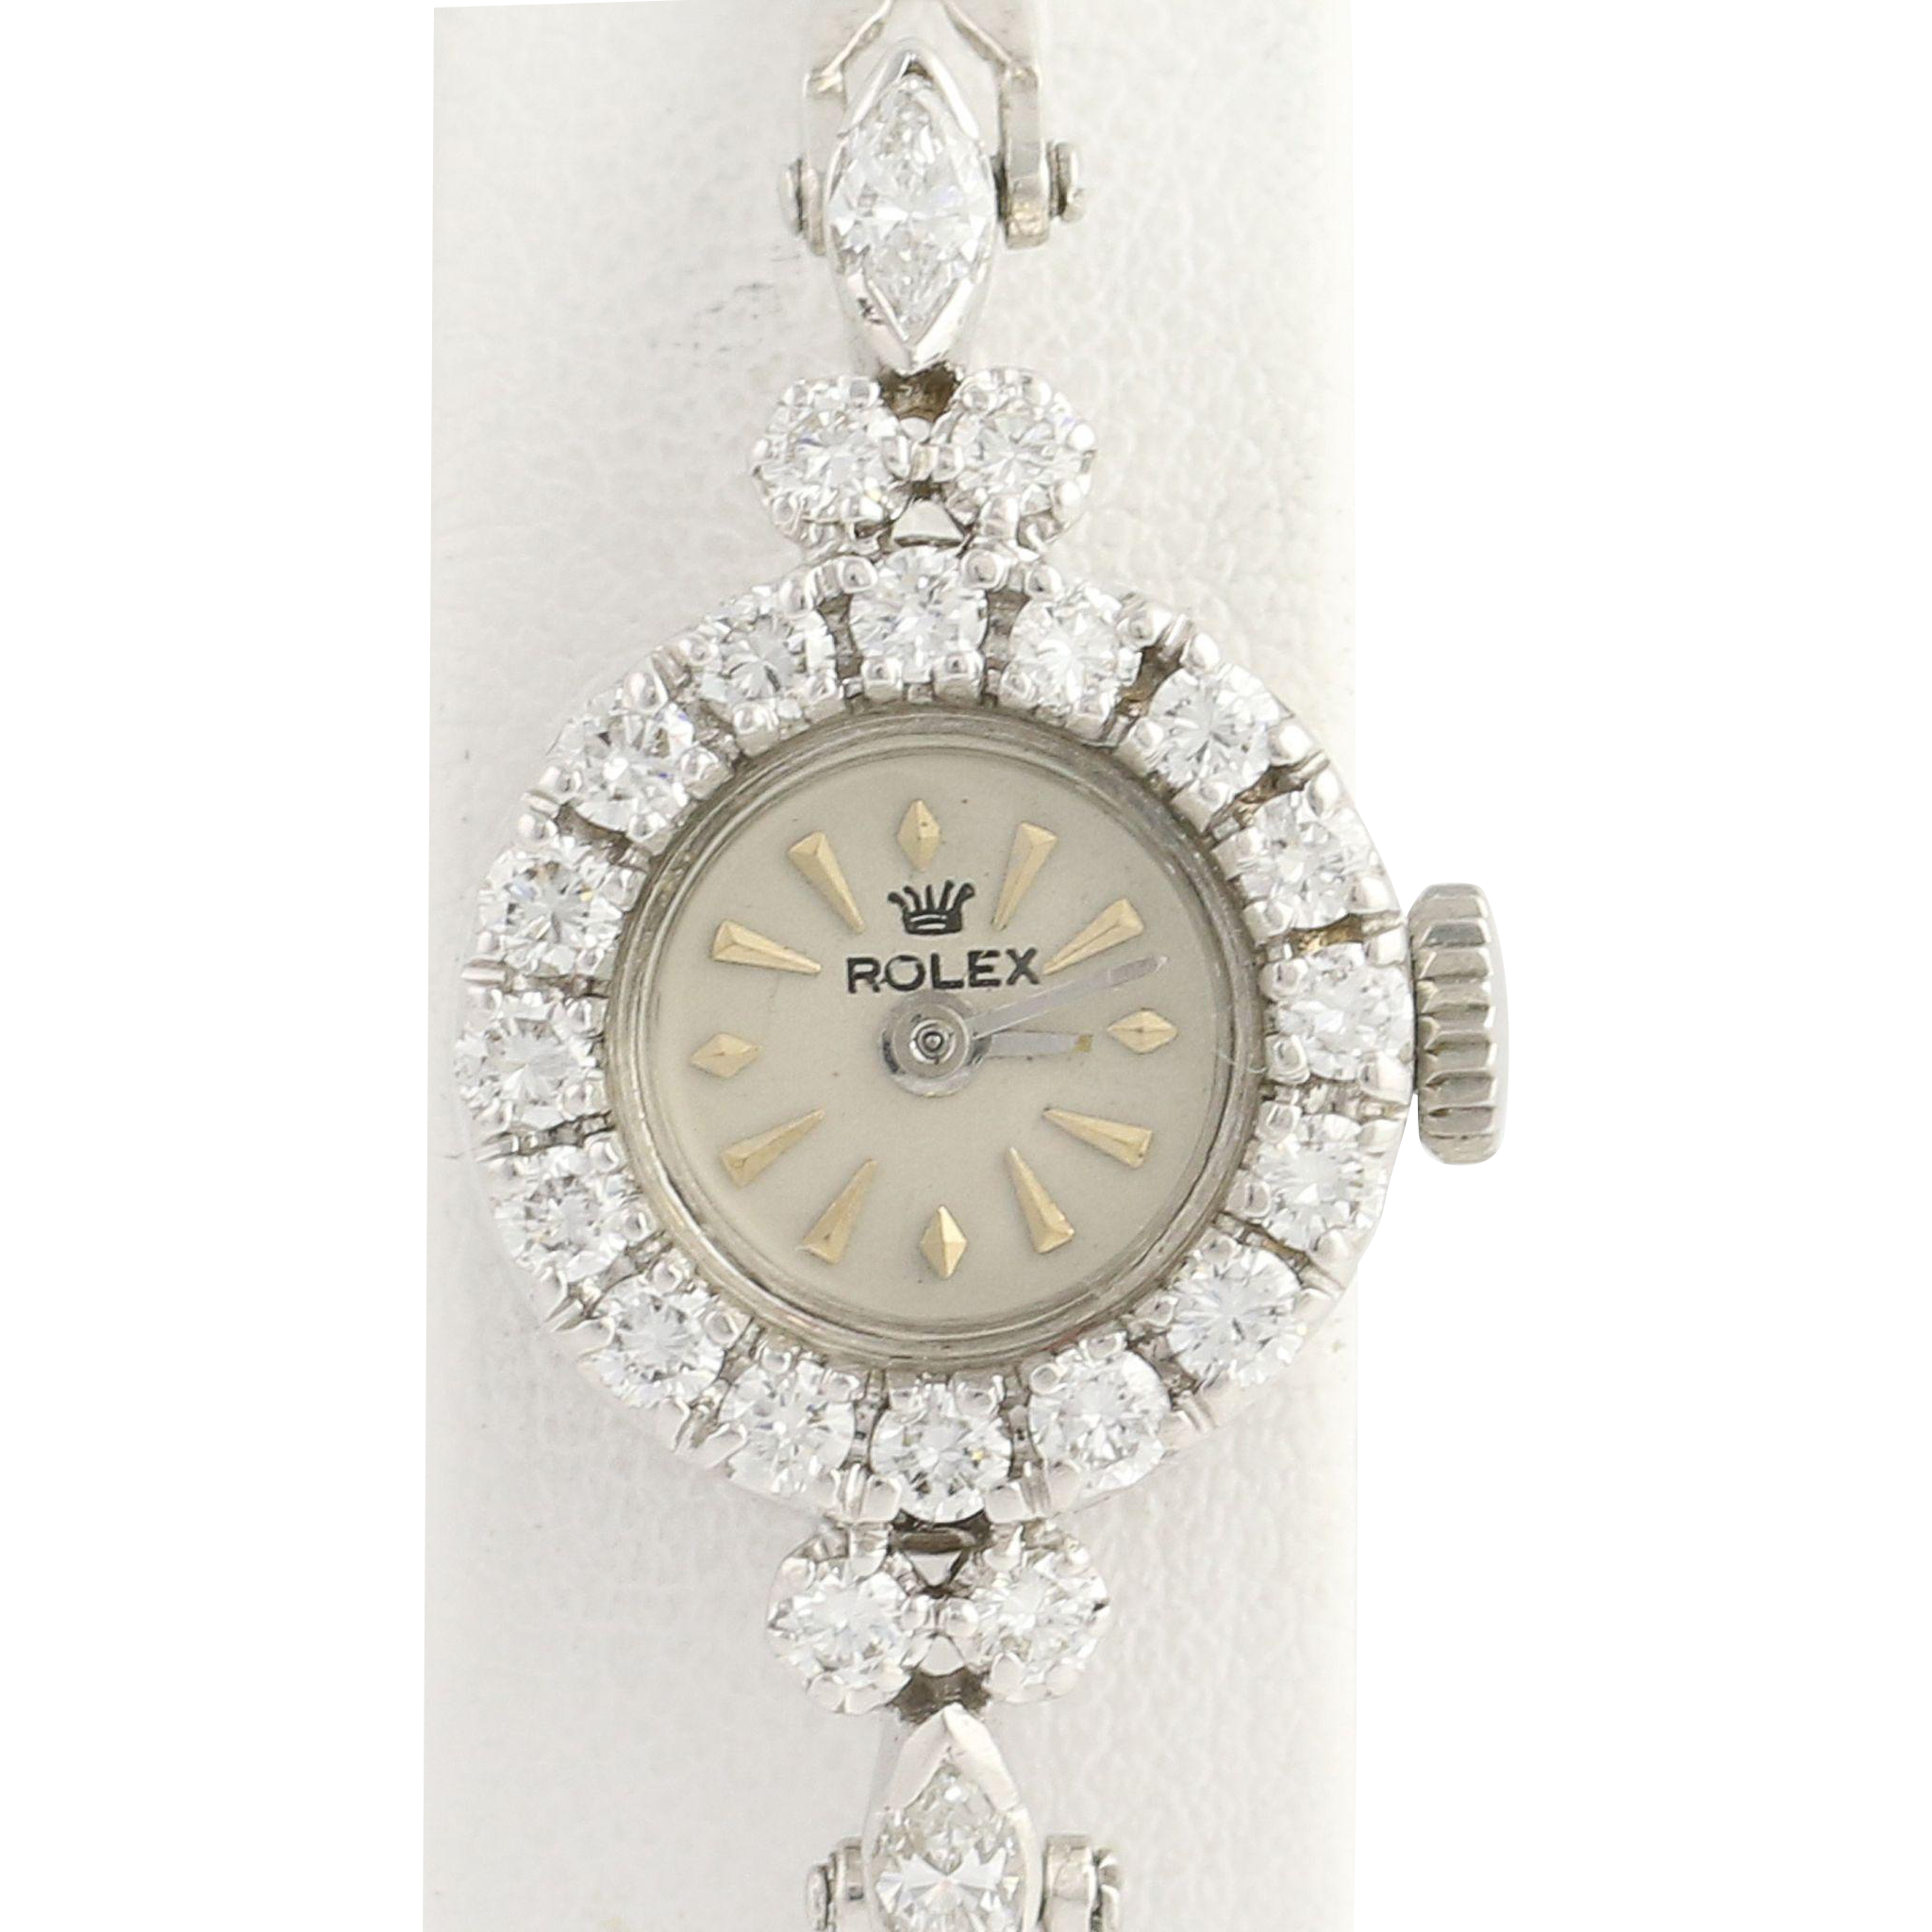 1940's Rolex Diamond Wristwatch - 14k Gold Vintage Mechanical 1.15ctw